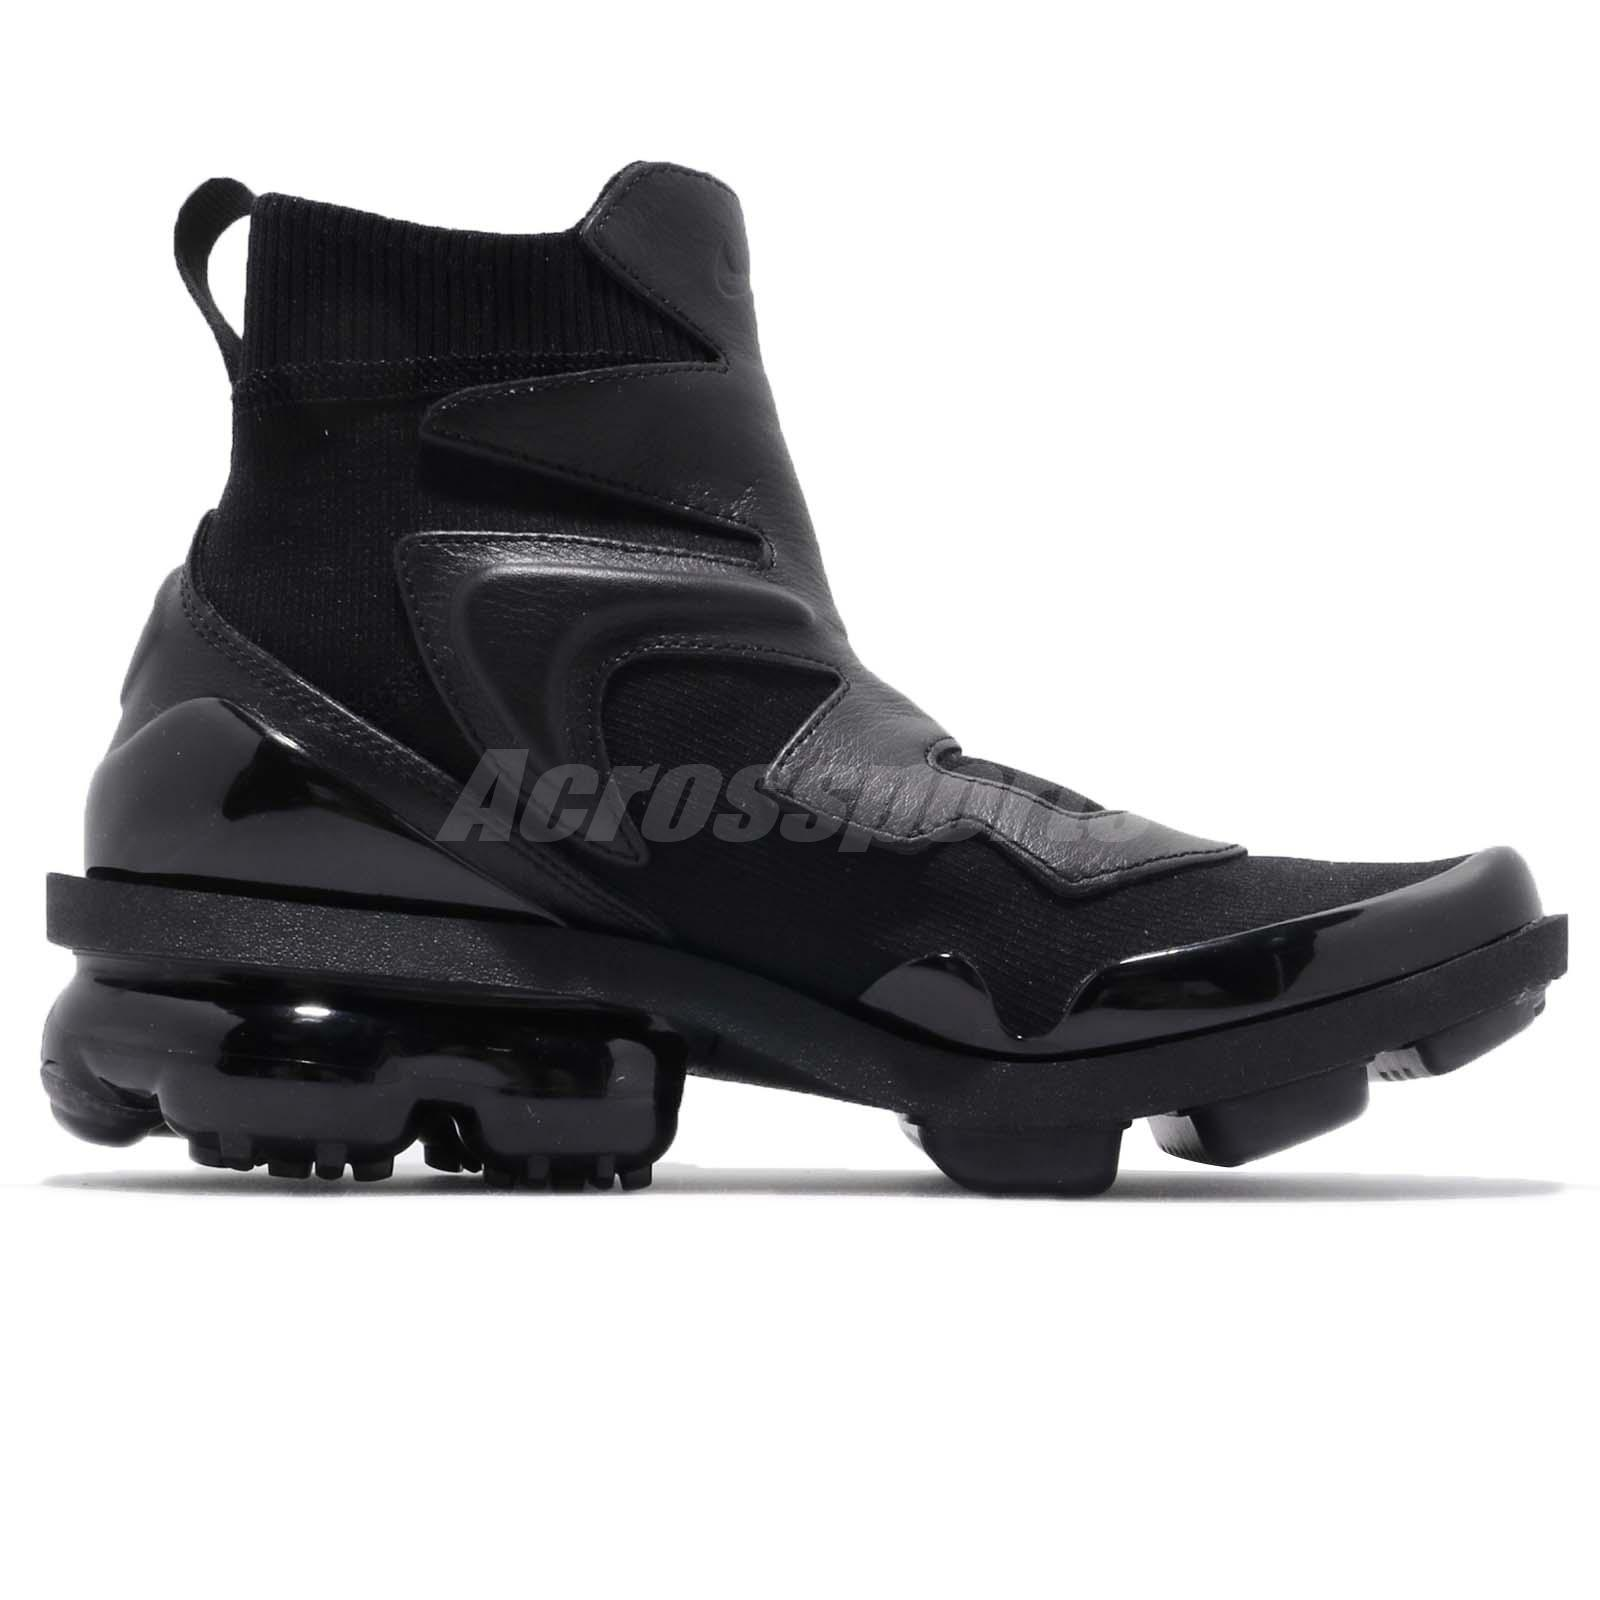 c5b2a2f442c Nike Wmns Vapormax Light II 2 Hi Triple Black Women Fashion Shoes ...